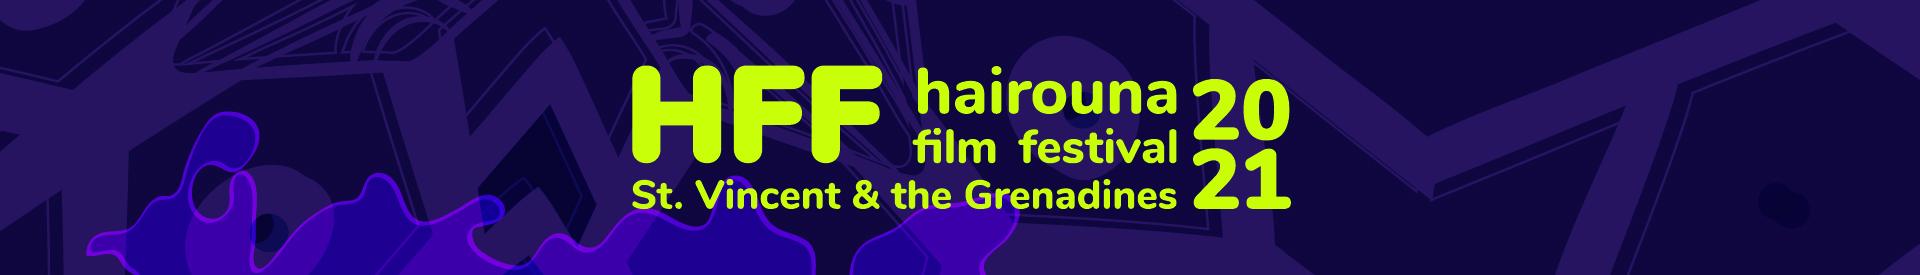 Hairouna Film Festival